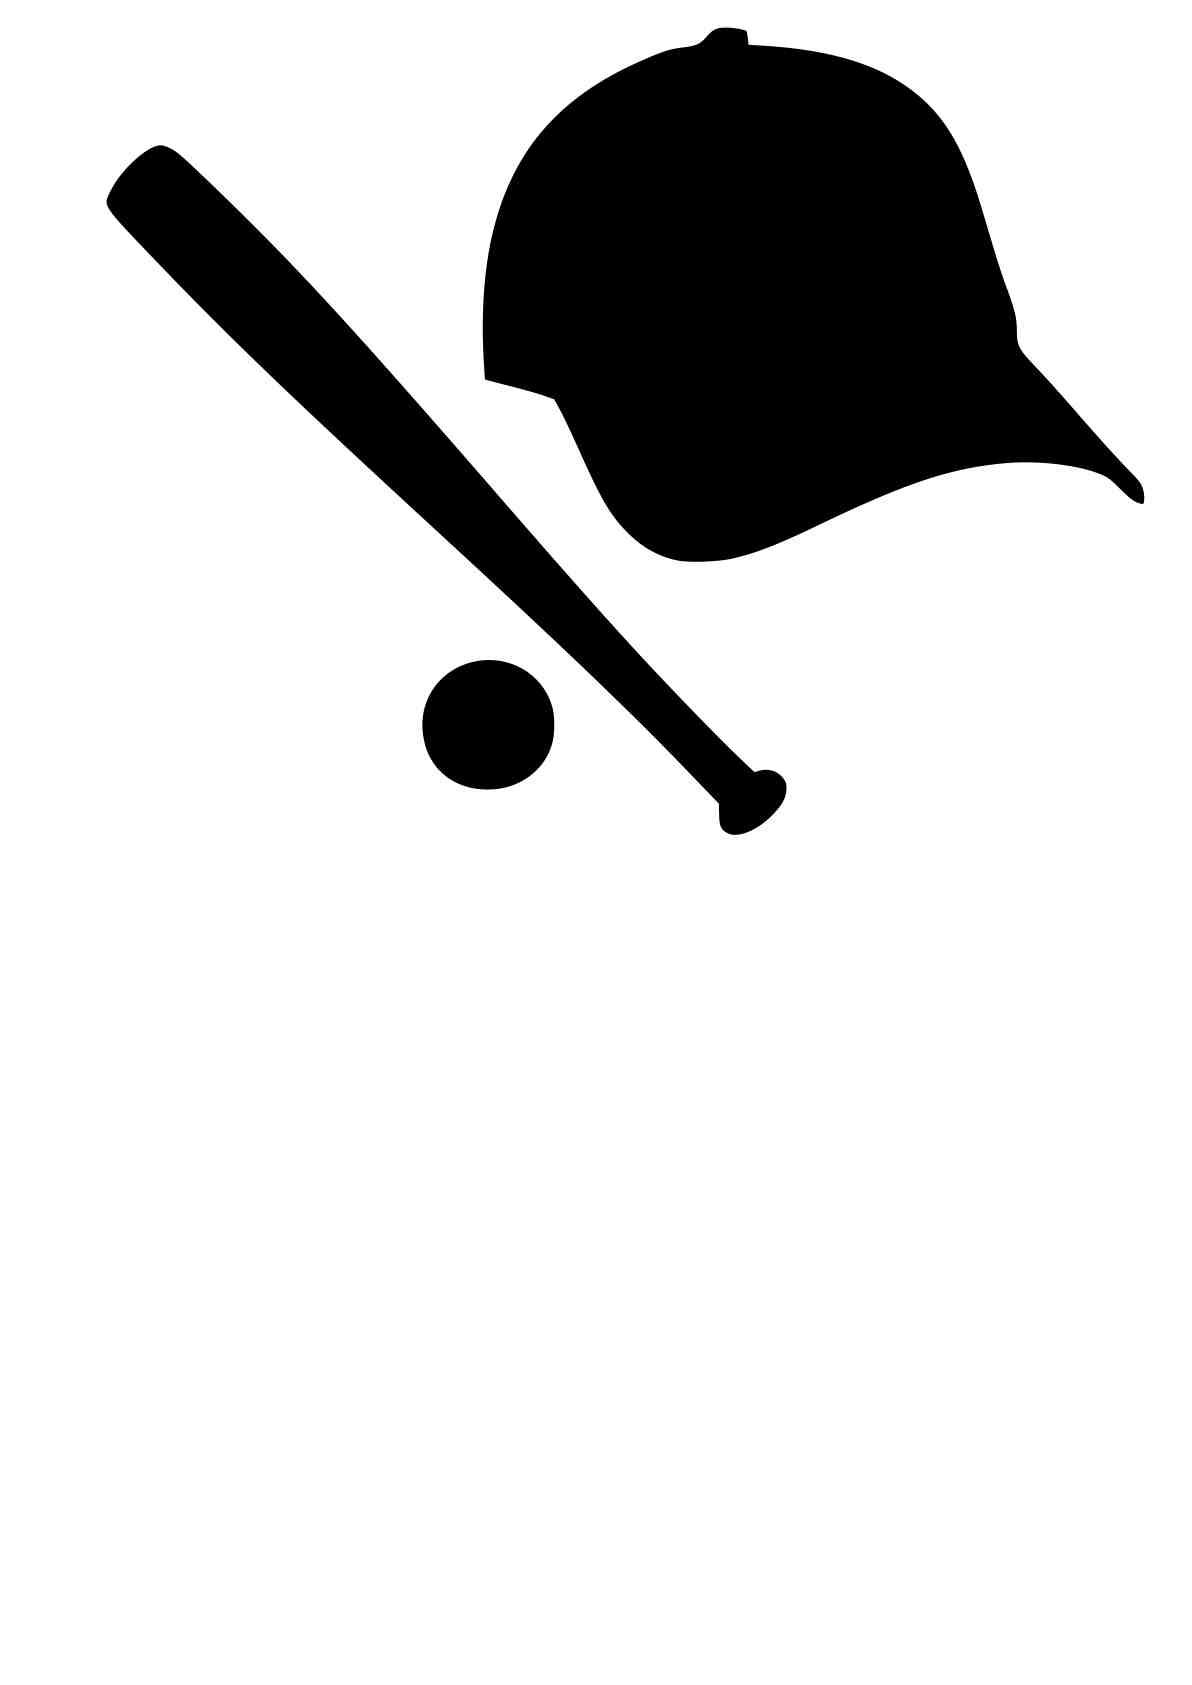 1192x1685 Free Svg Download Baseball Hat, Ball Amp Bat Beaoriginal